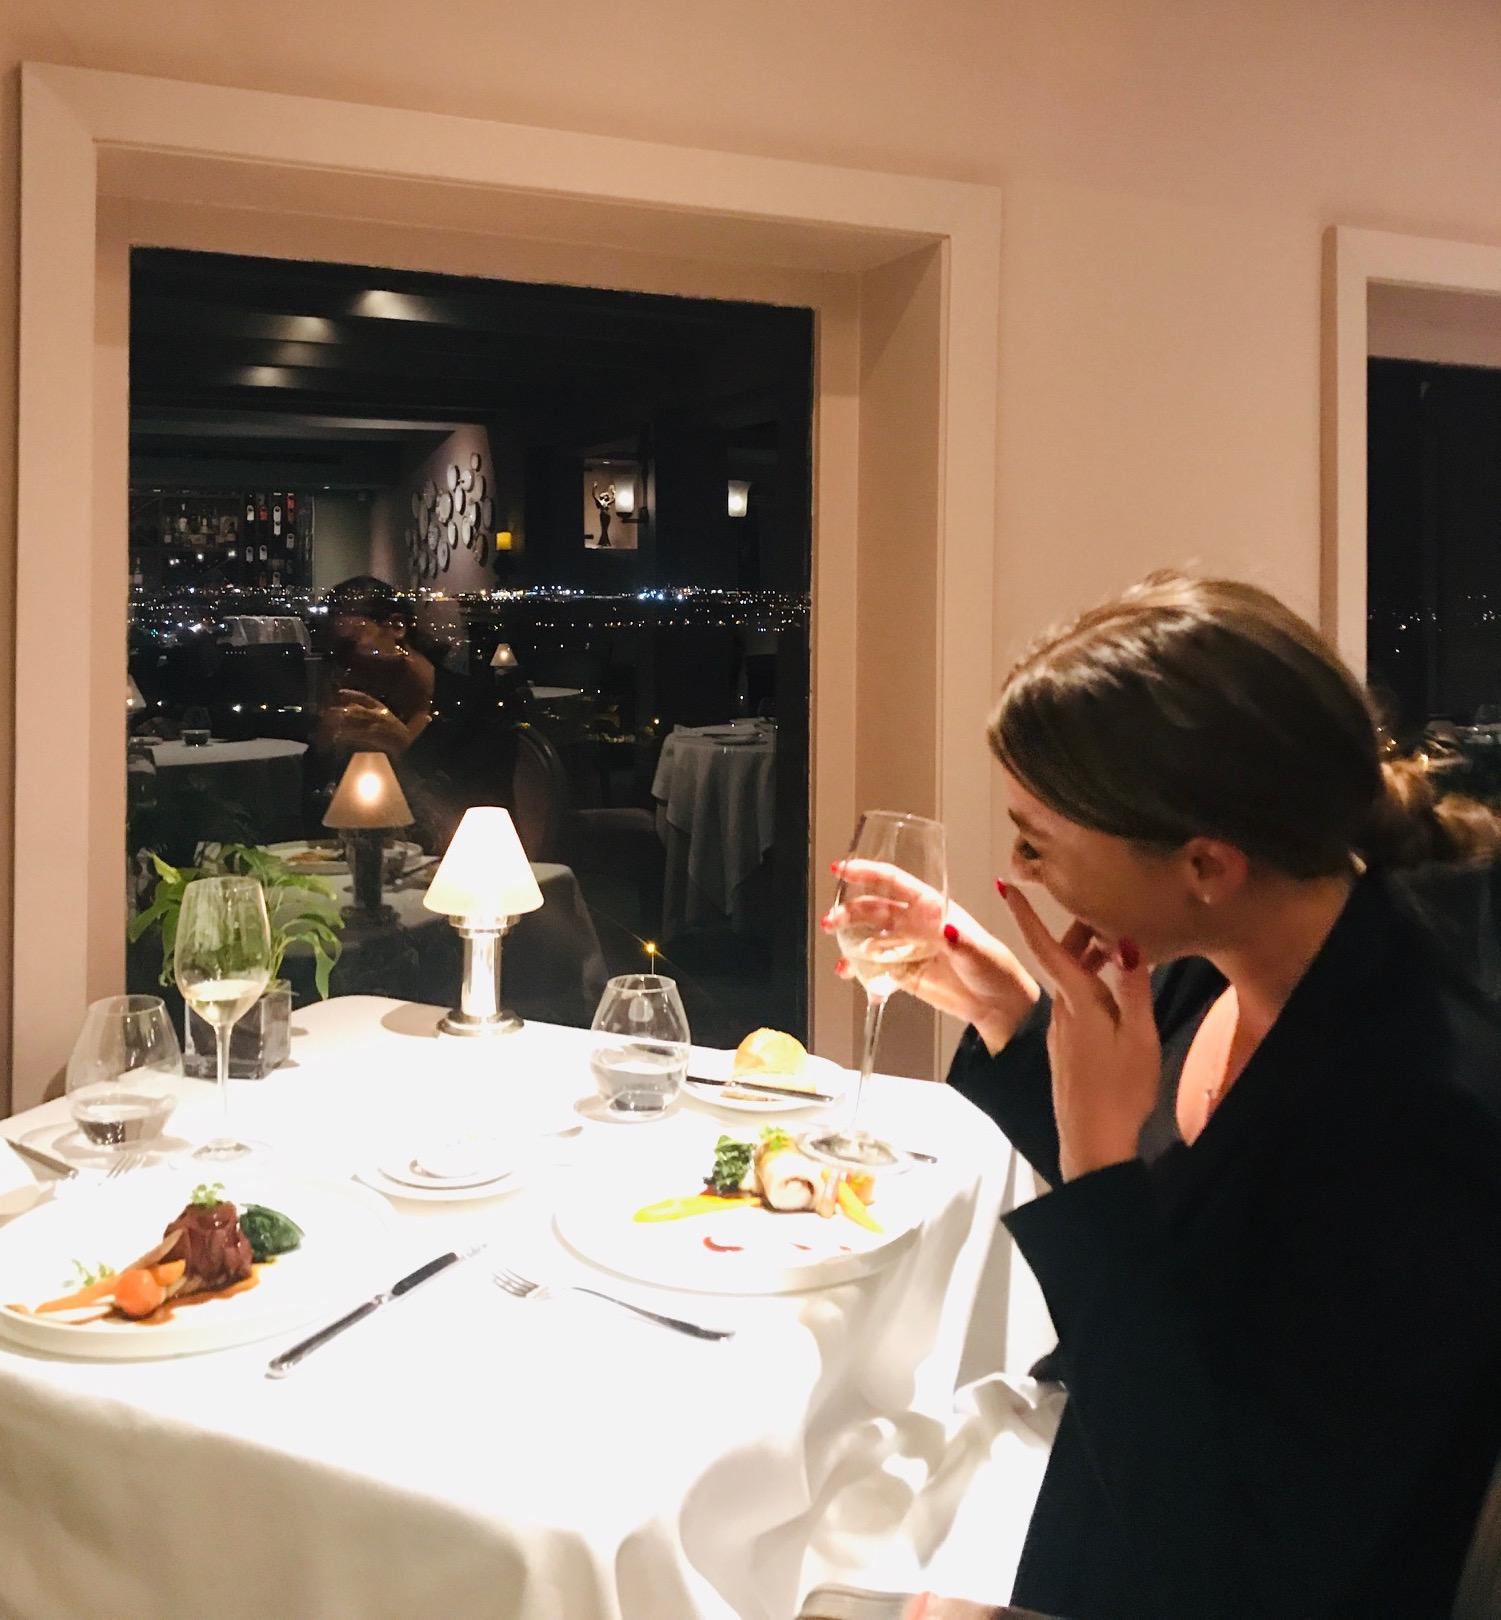 de-mondion-restaurant-malta-lustforthesublime